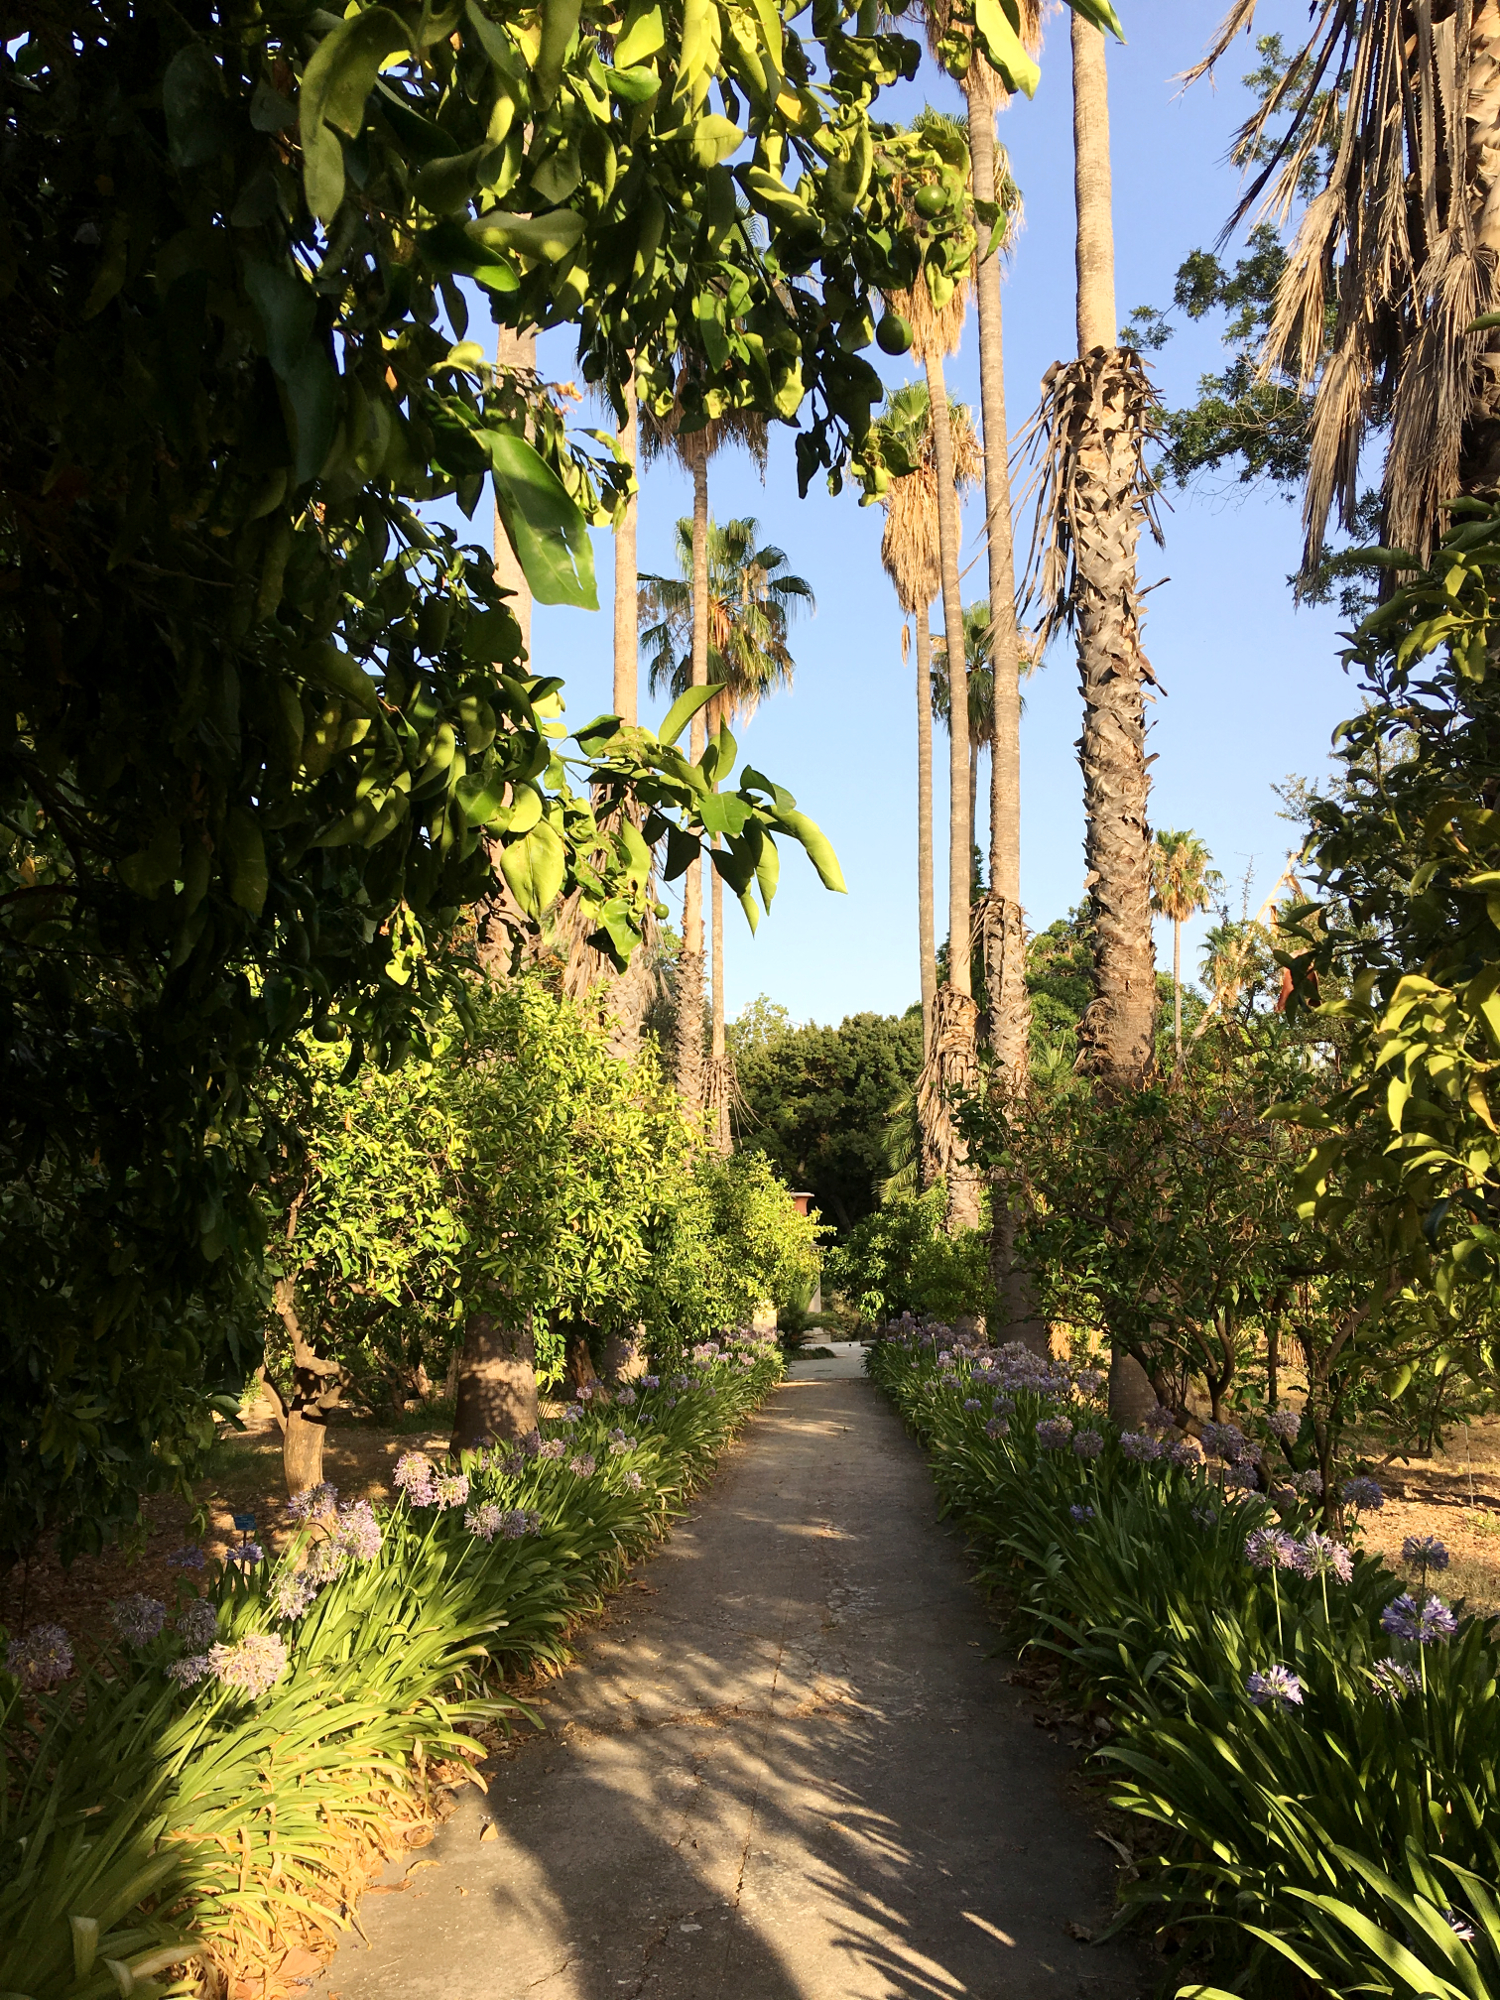 rocaille-blog-palermo-orto-botanico-botanical-garden-29